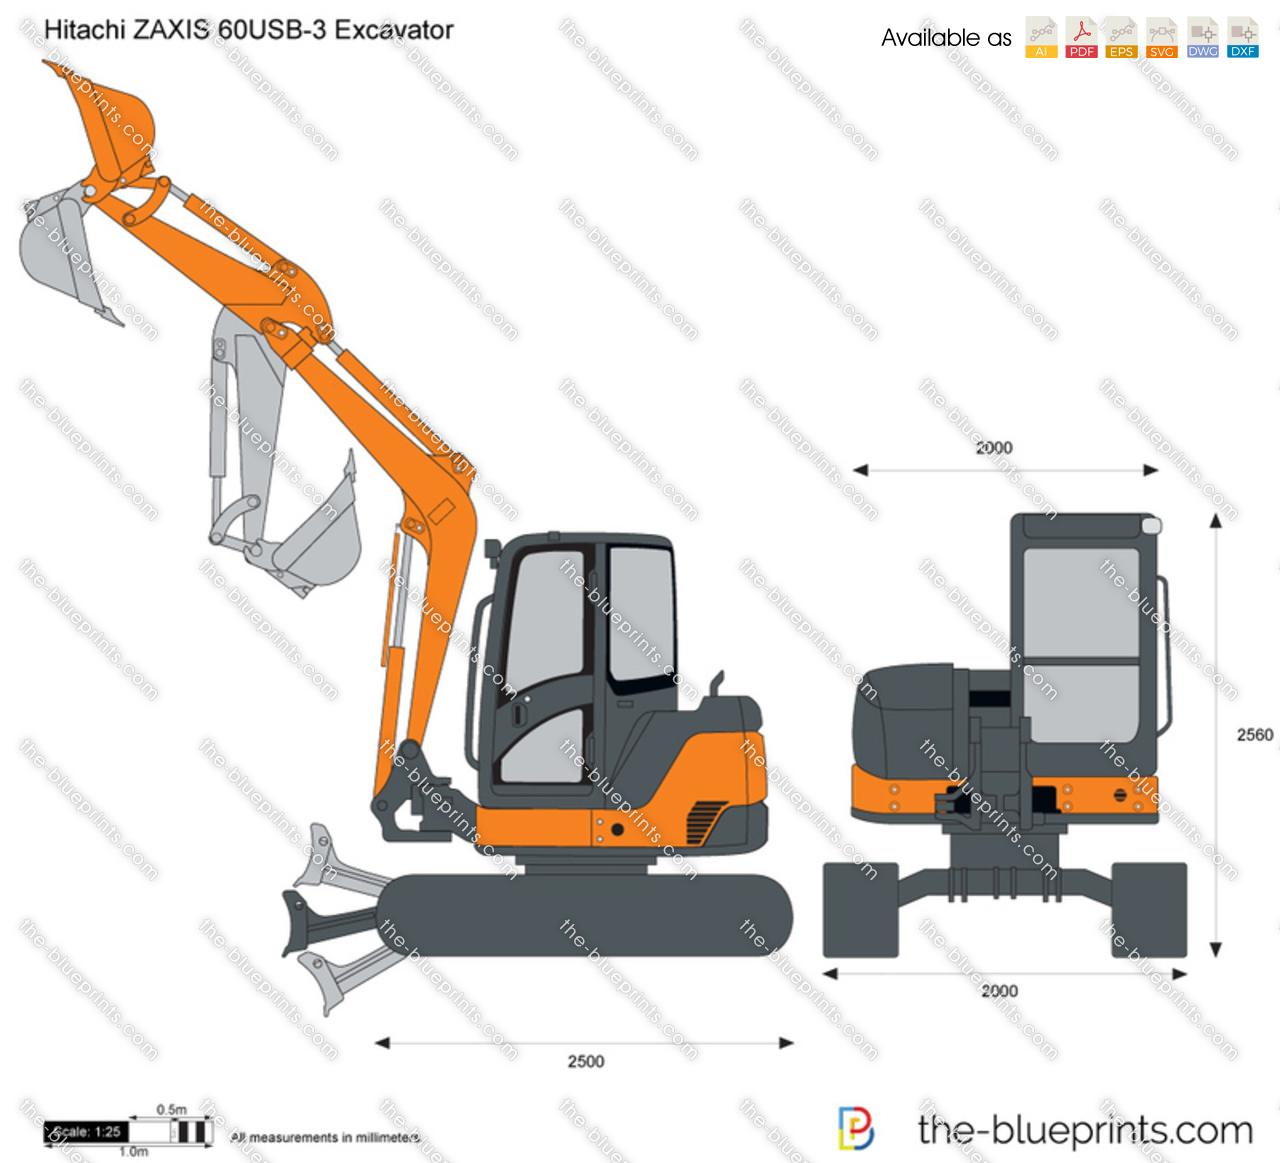 Hitachi ZAXIS 60USB-3 Excavator